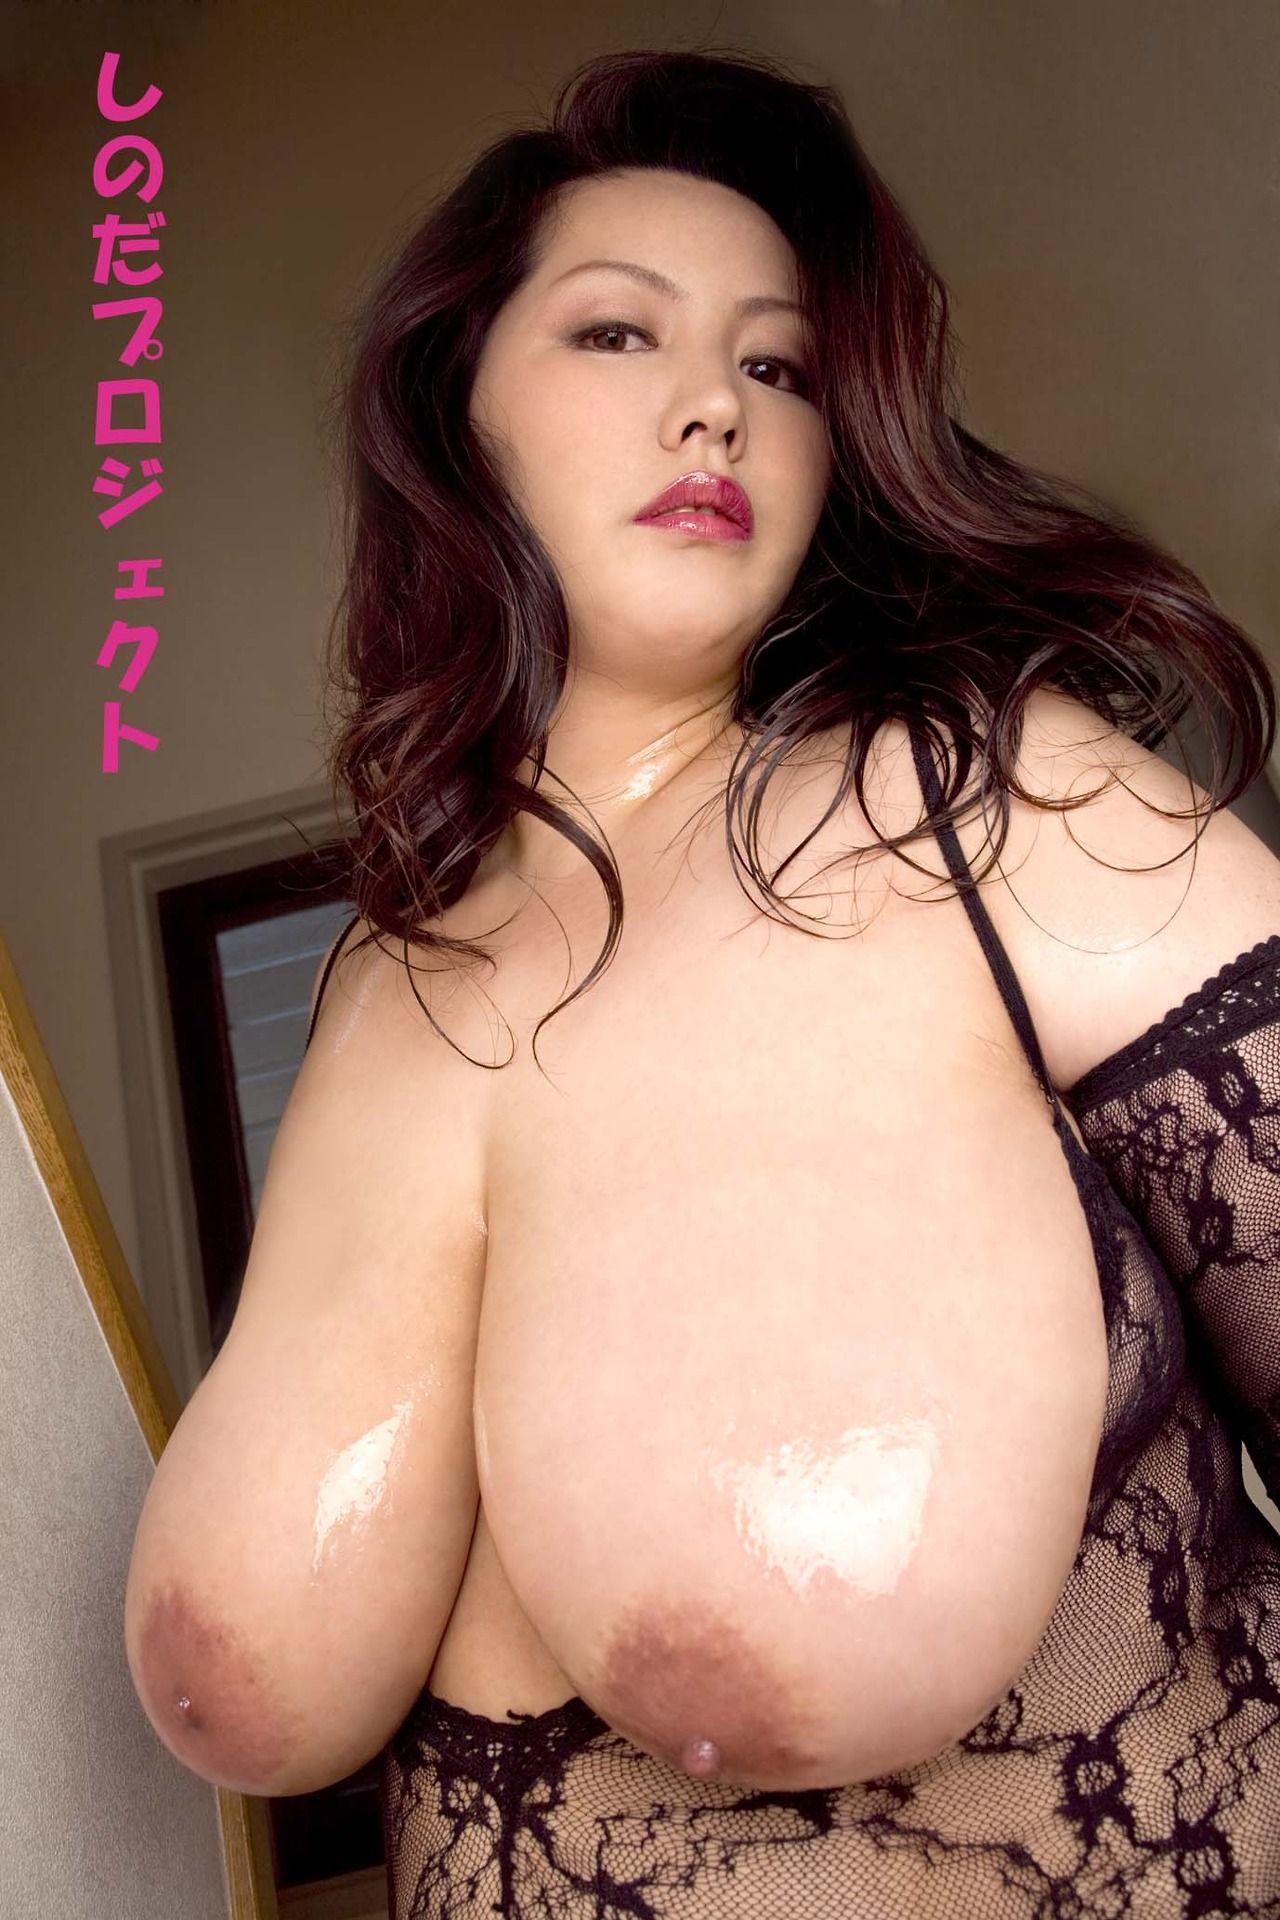 Asian boobs movie think, that